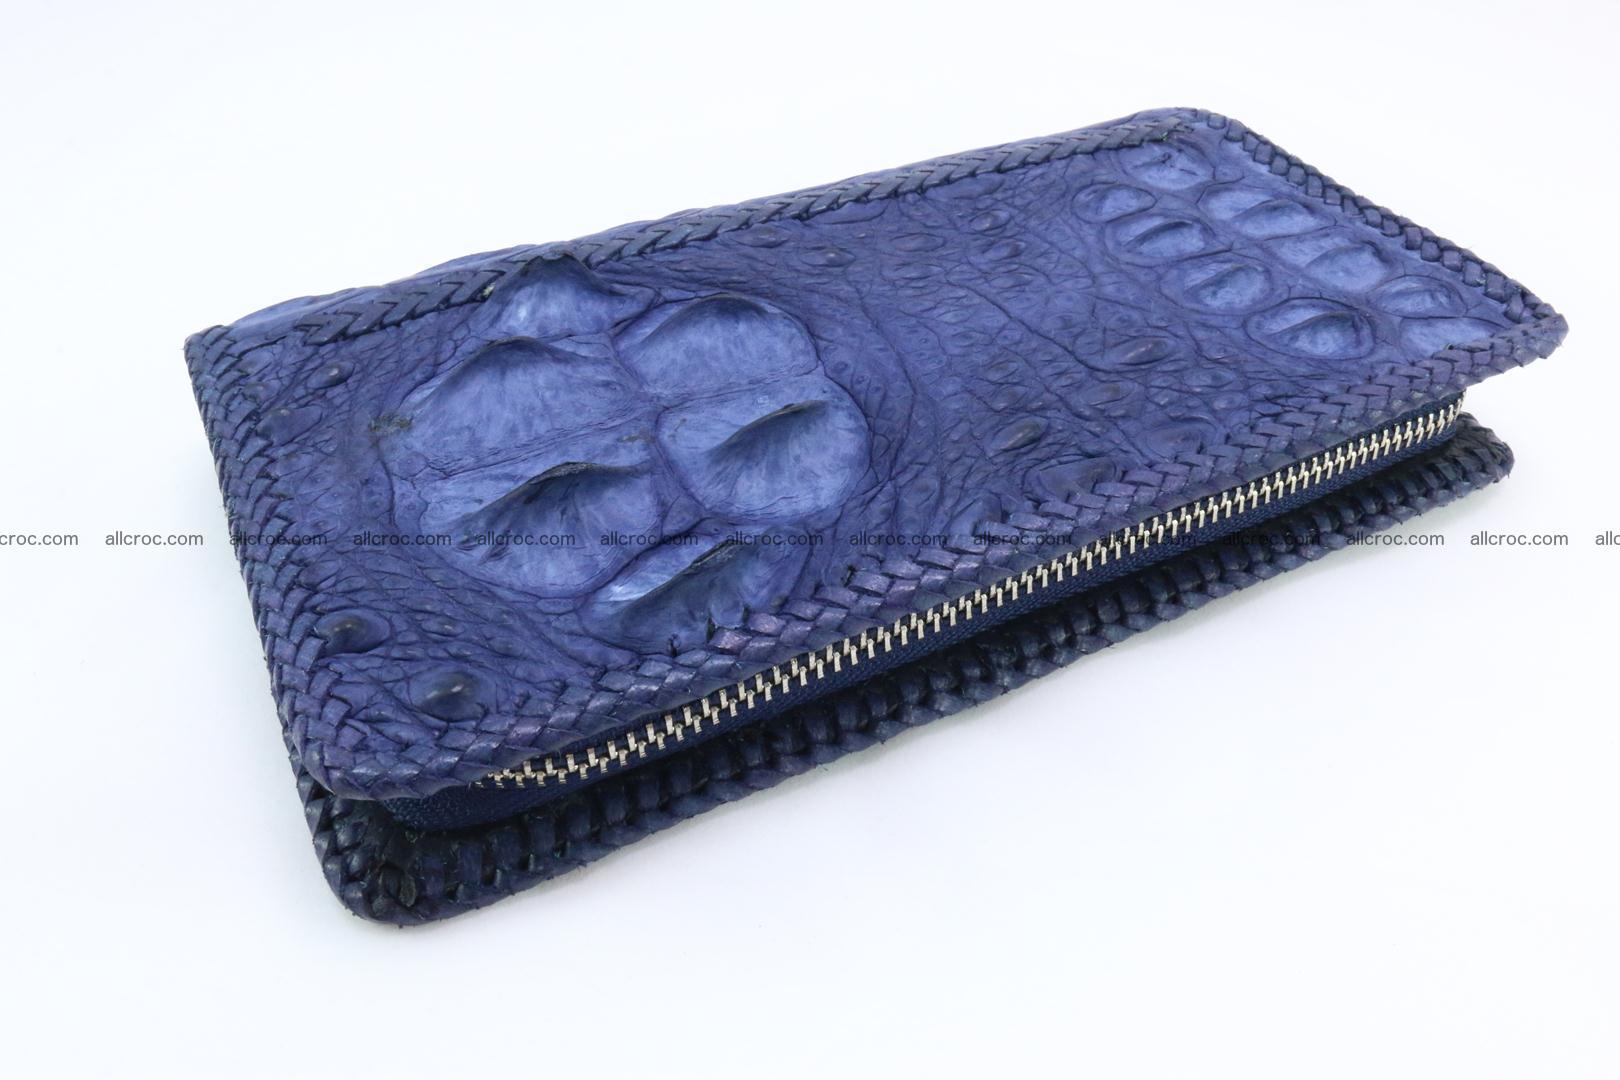 Genuine crocodile hornback wallet with zip 105 Foto 13